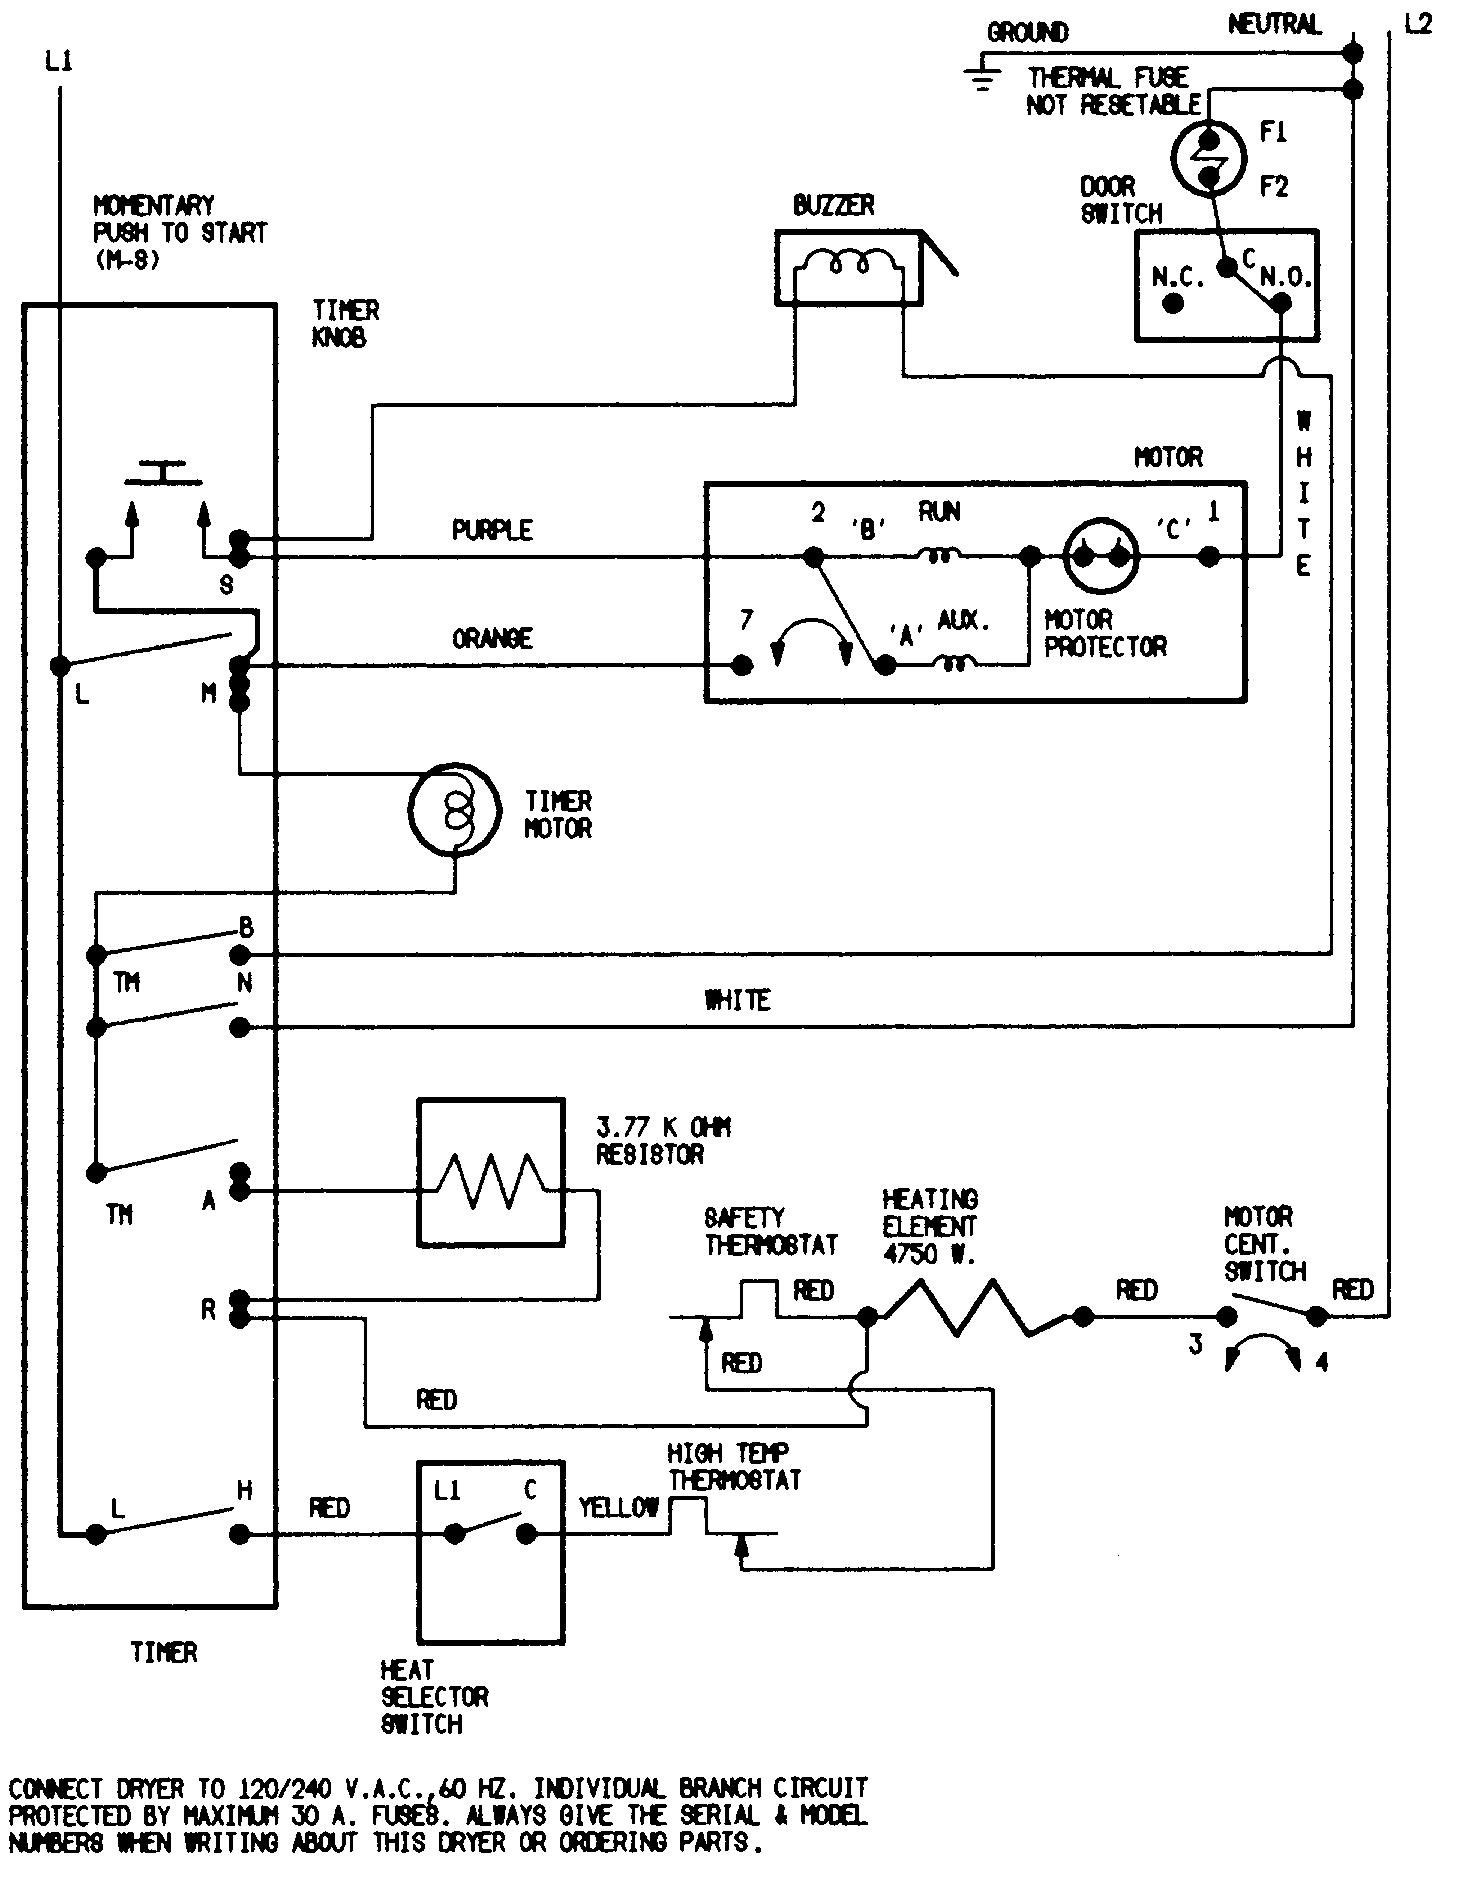 Magic Chef Refrigerator Sears 240 Volt Freezer Schematic